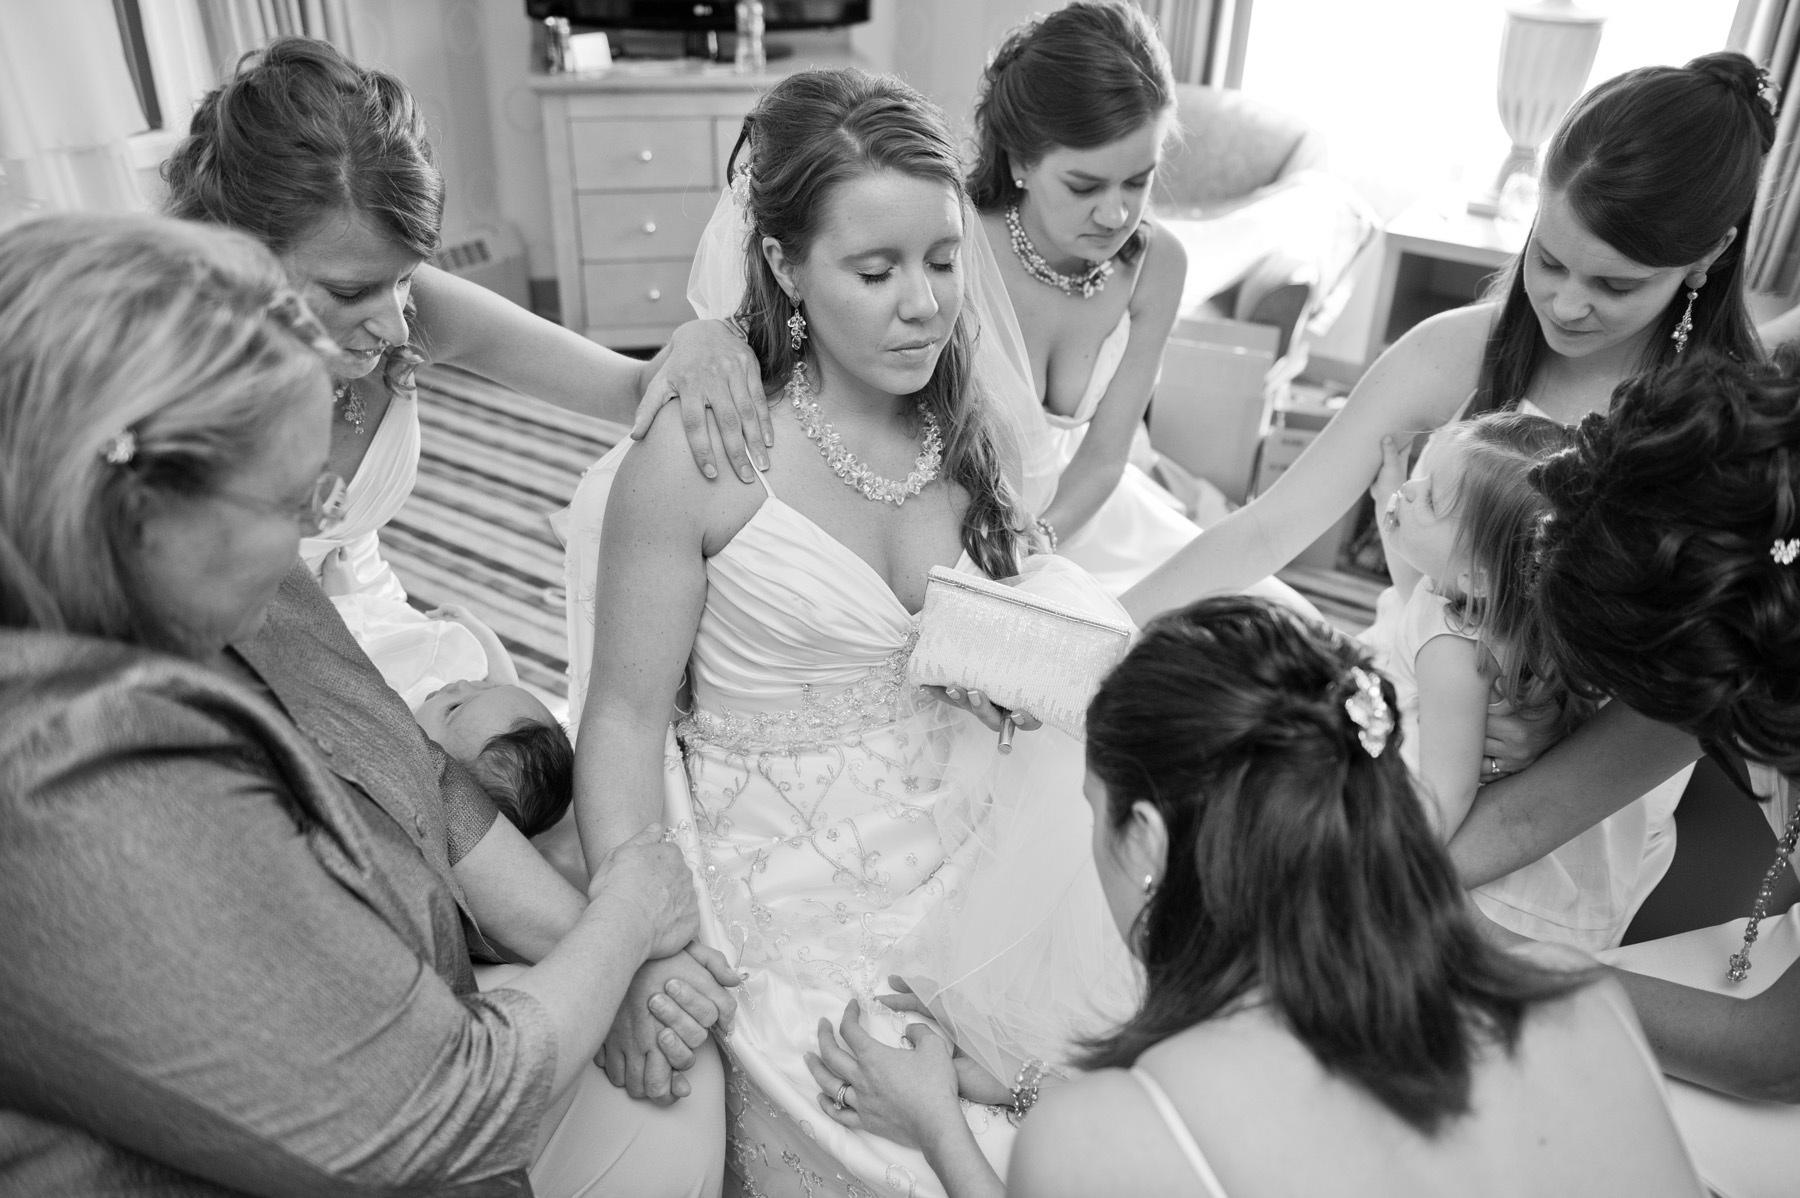 minneapolis-wedding-photography-mark-kegans-307.jpg